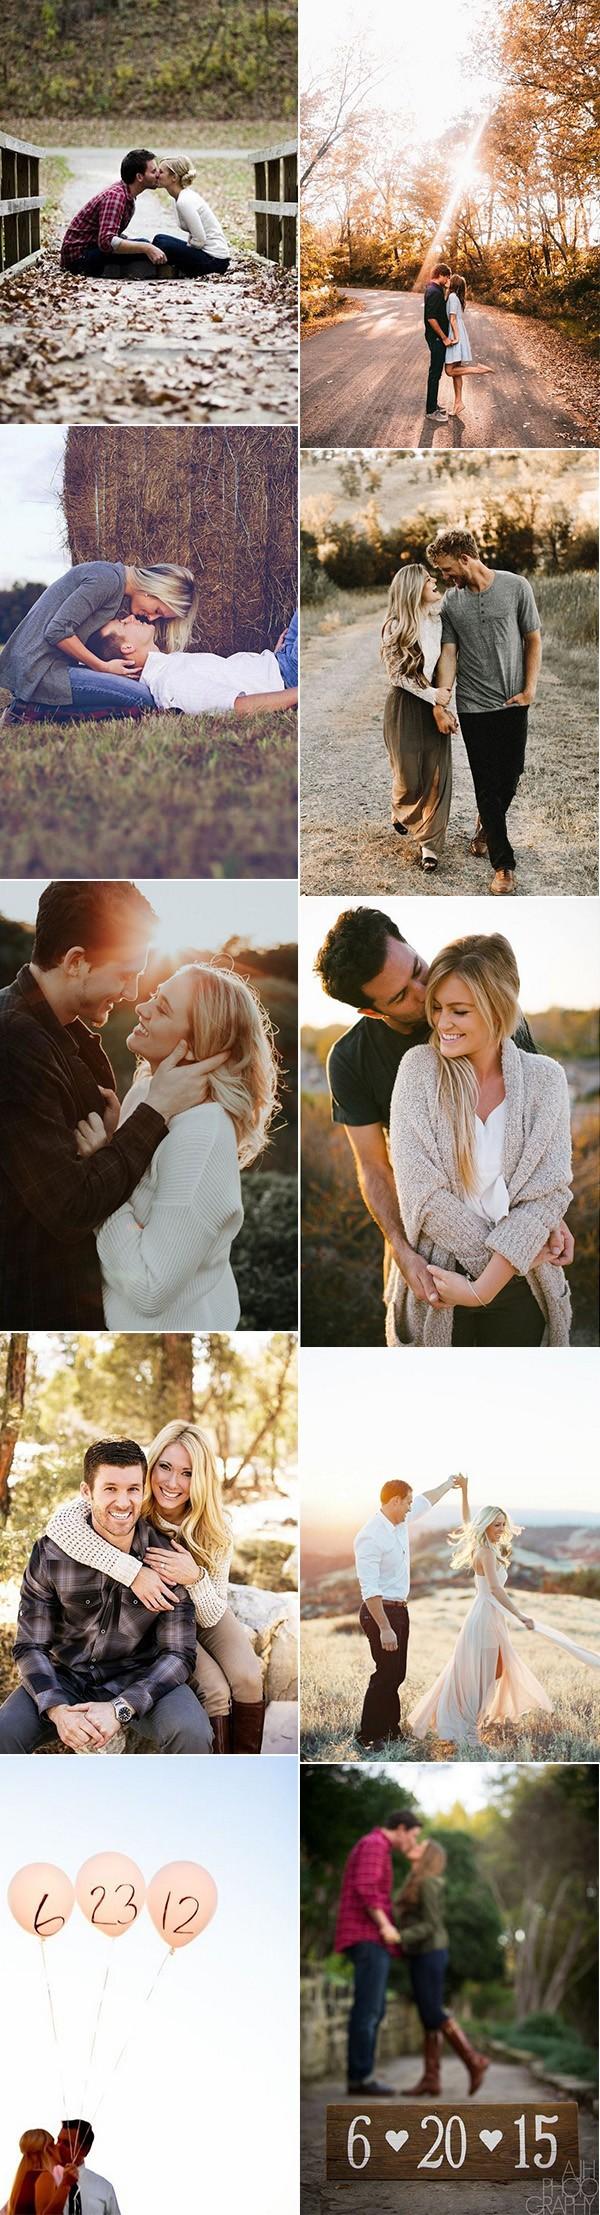 romantic engagement photo pose ideas